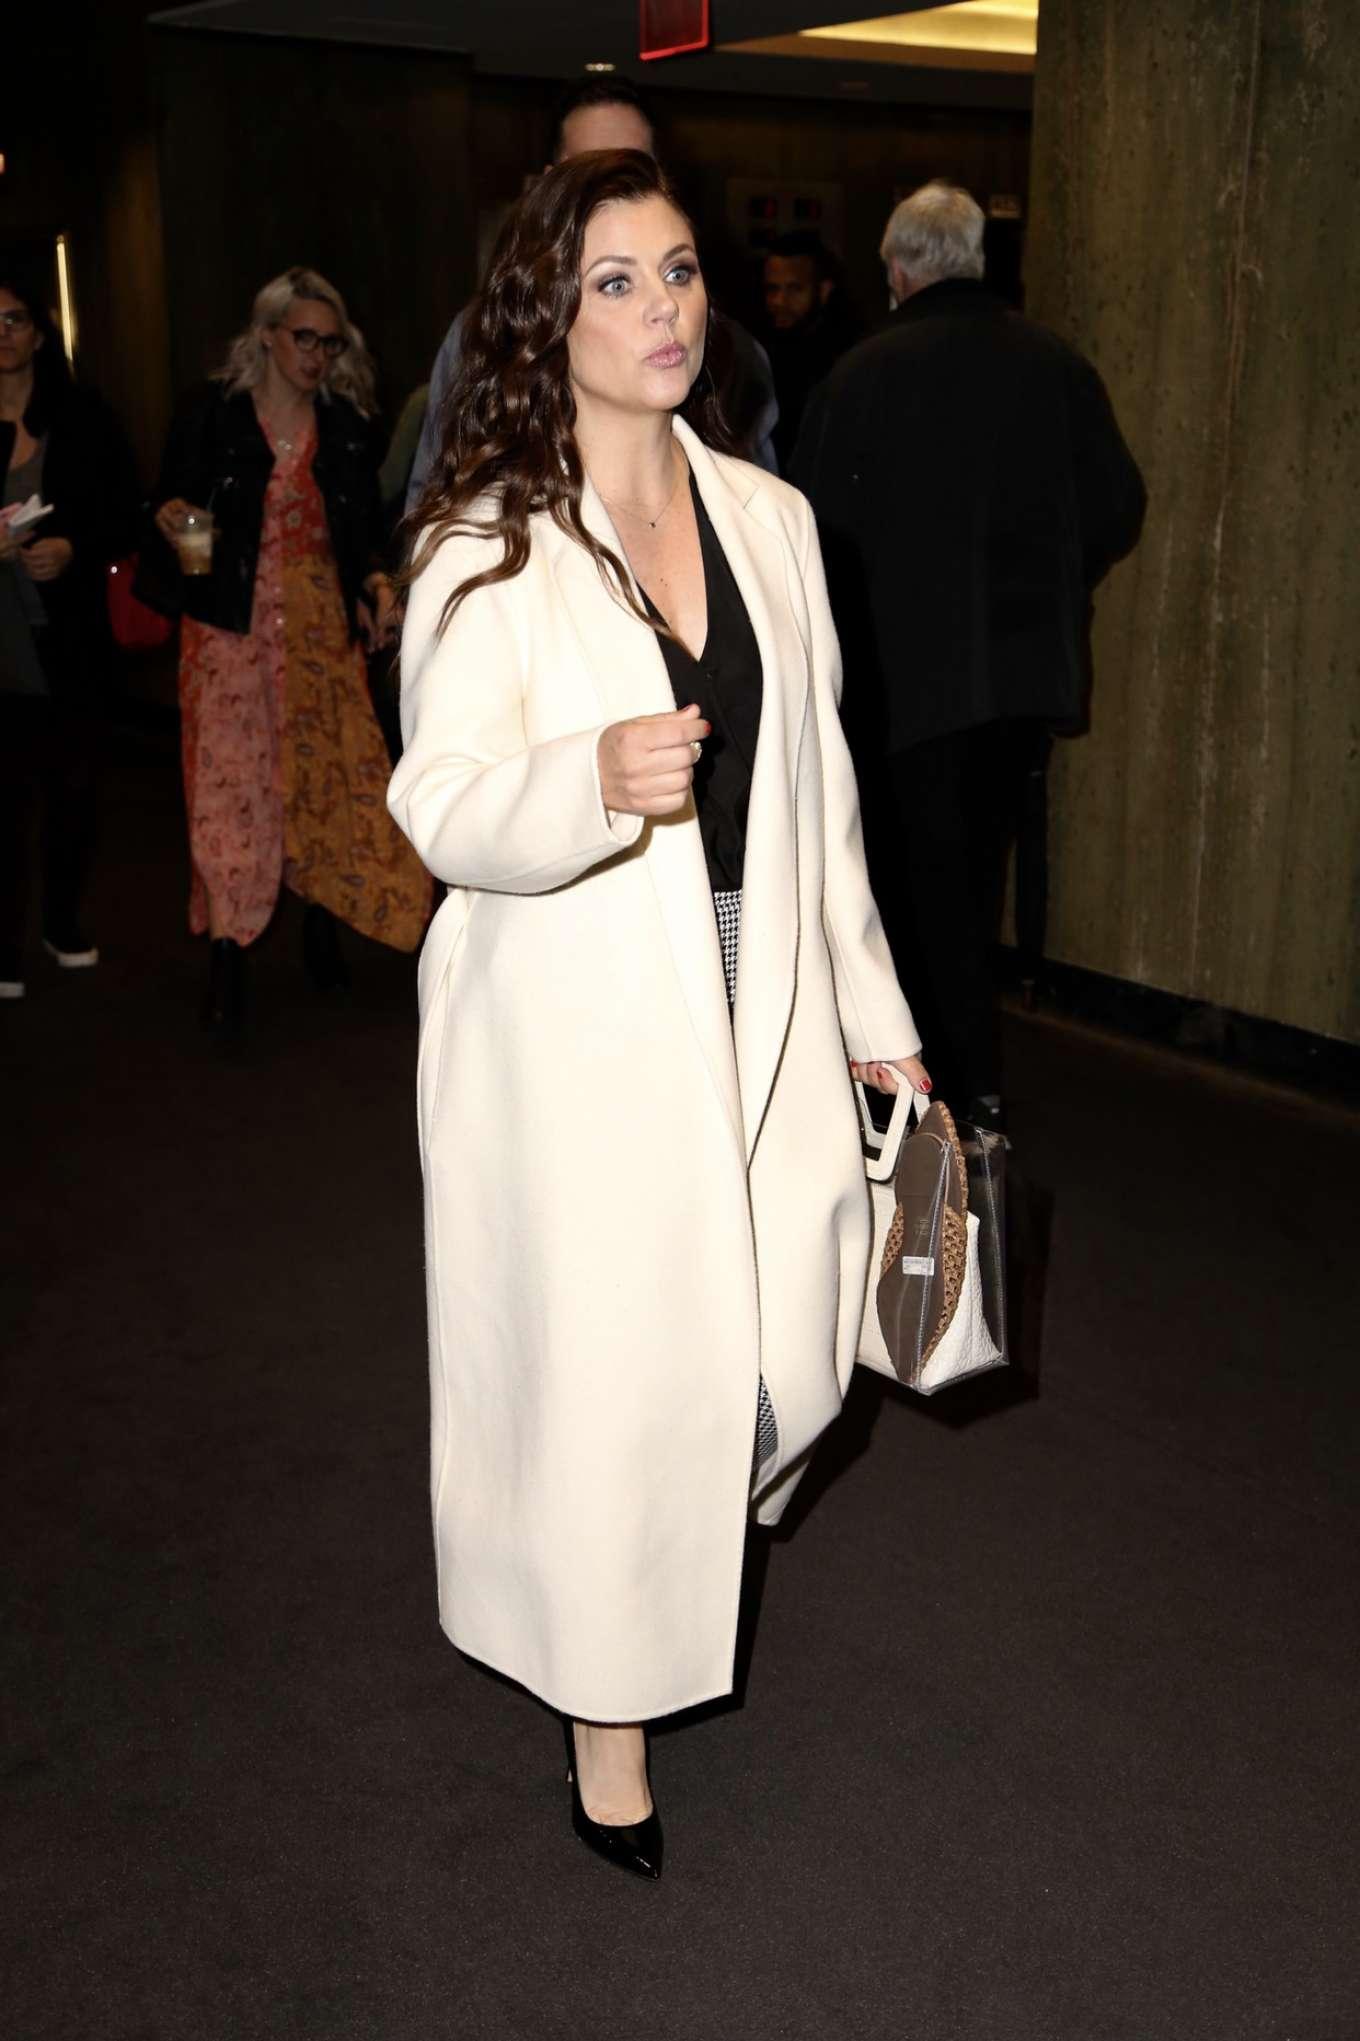 Loris black ribbed cuff sweater on Alexa & Katie in 2020 | Tv show outfits, Fashion tv, Black rib